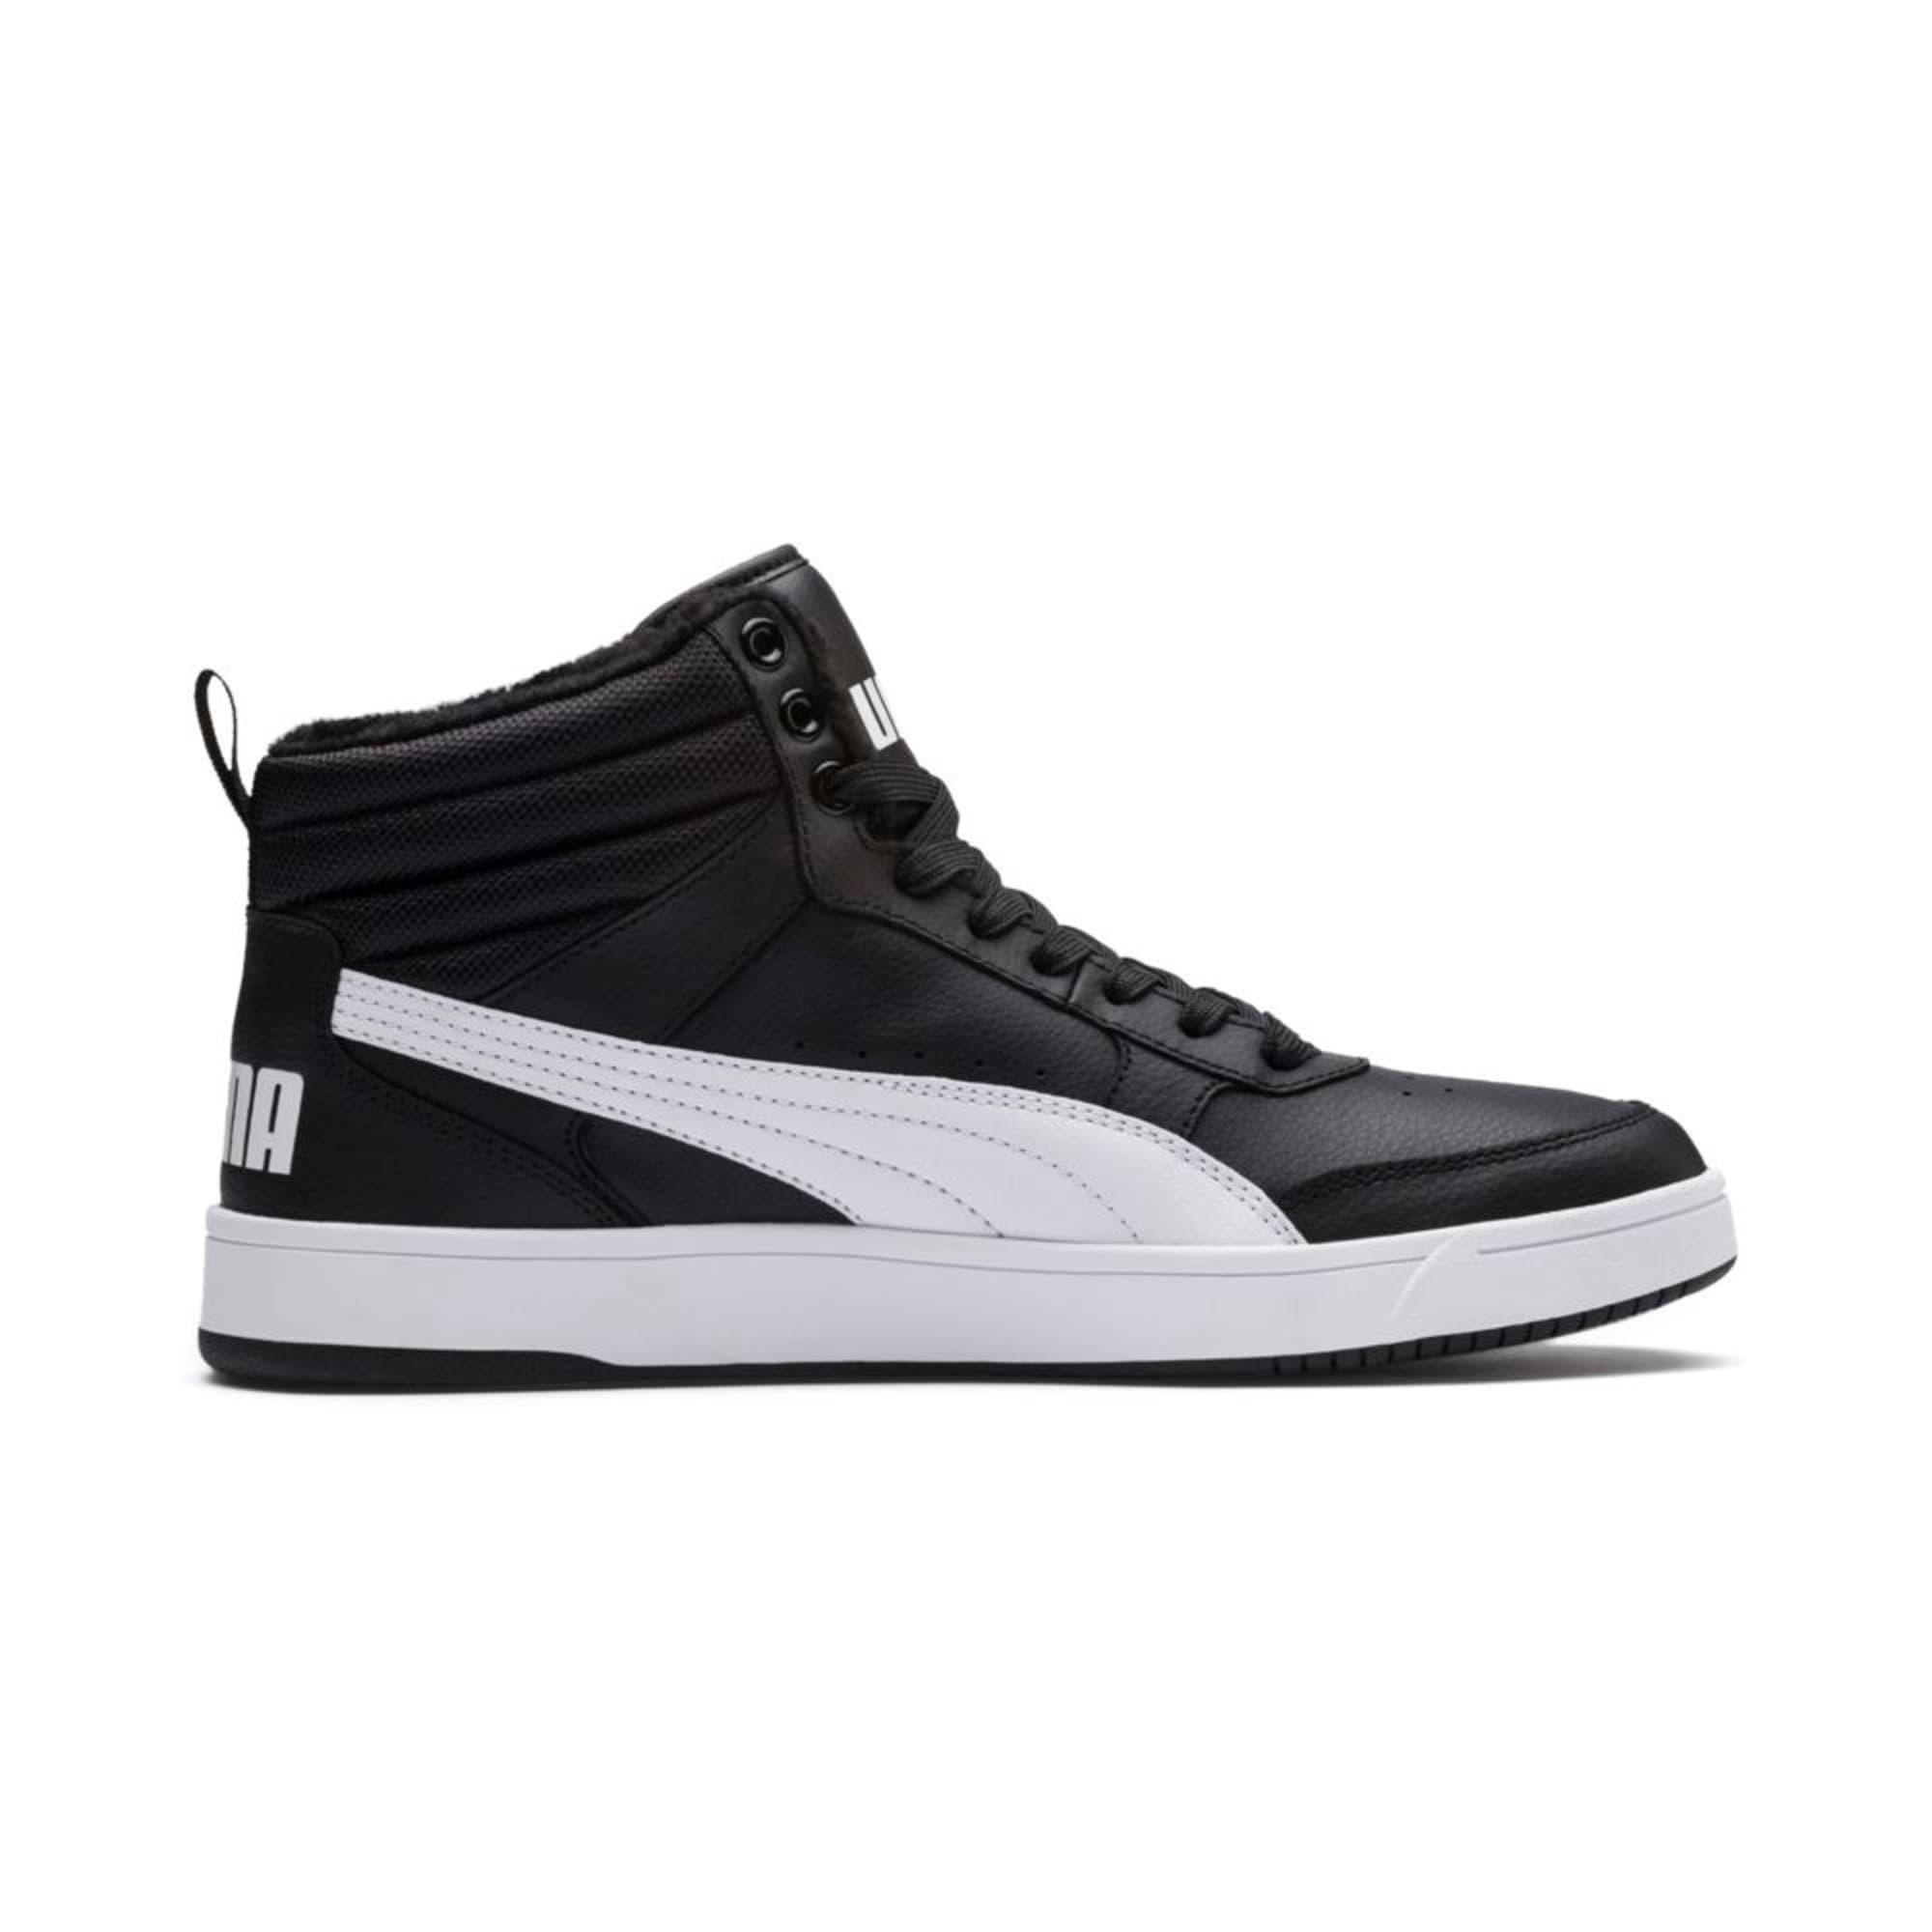 Thumbnail 5 of Rebound Street v2 Fur High Tops, Puma Black-Puma White, medium-IND